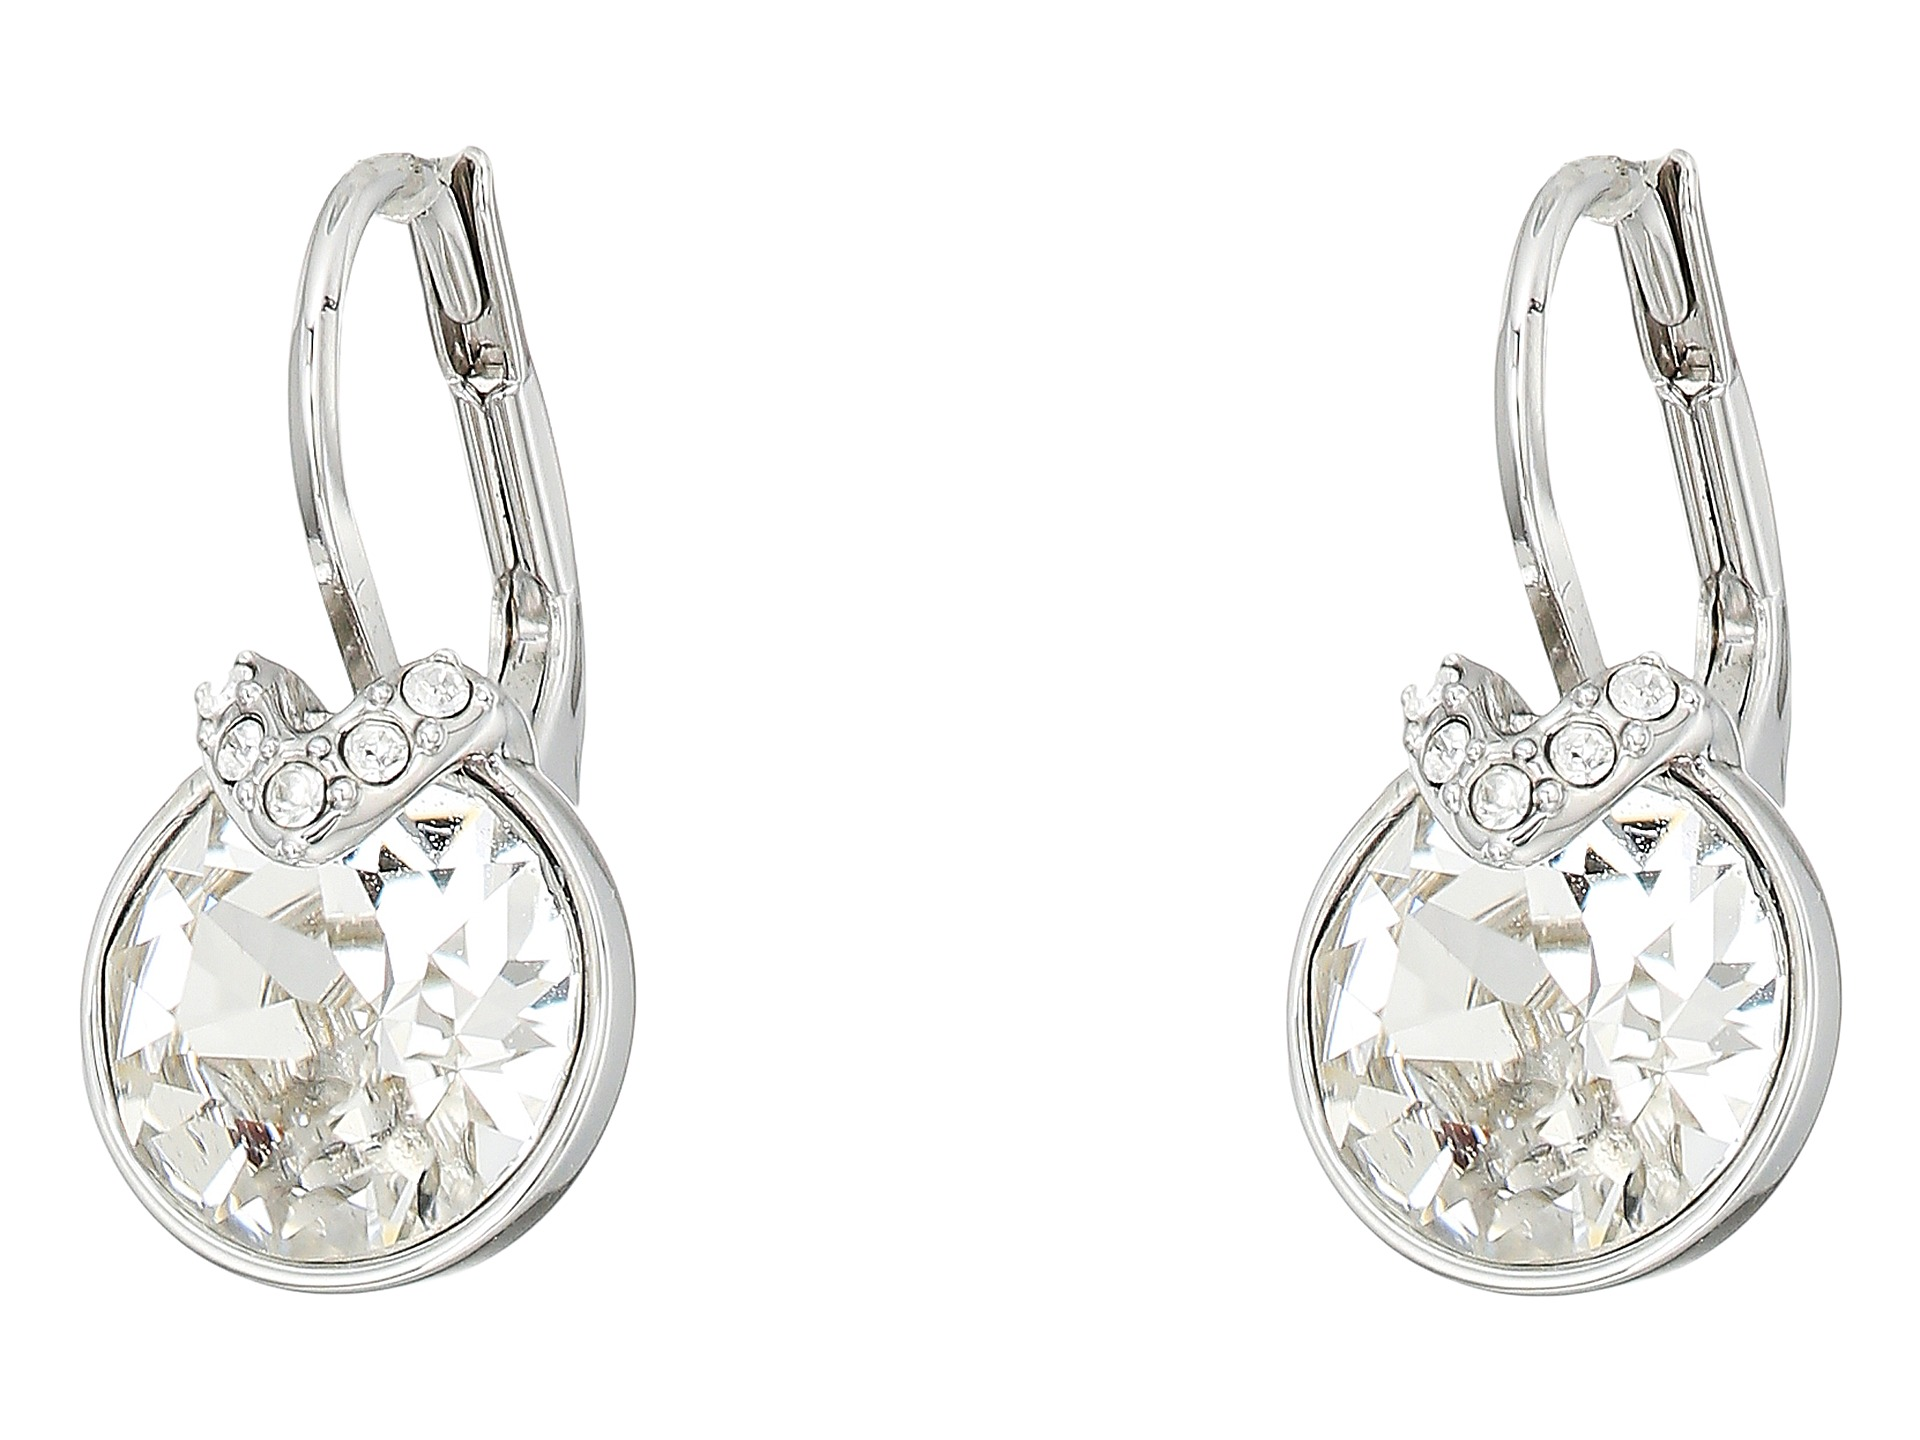 Swarovski Bella Pierced Earrings at Zappos.com